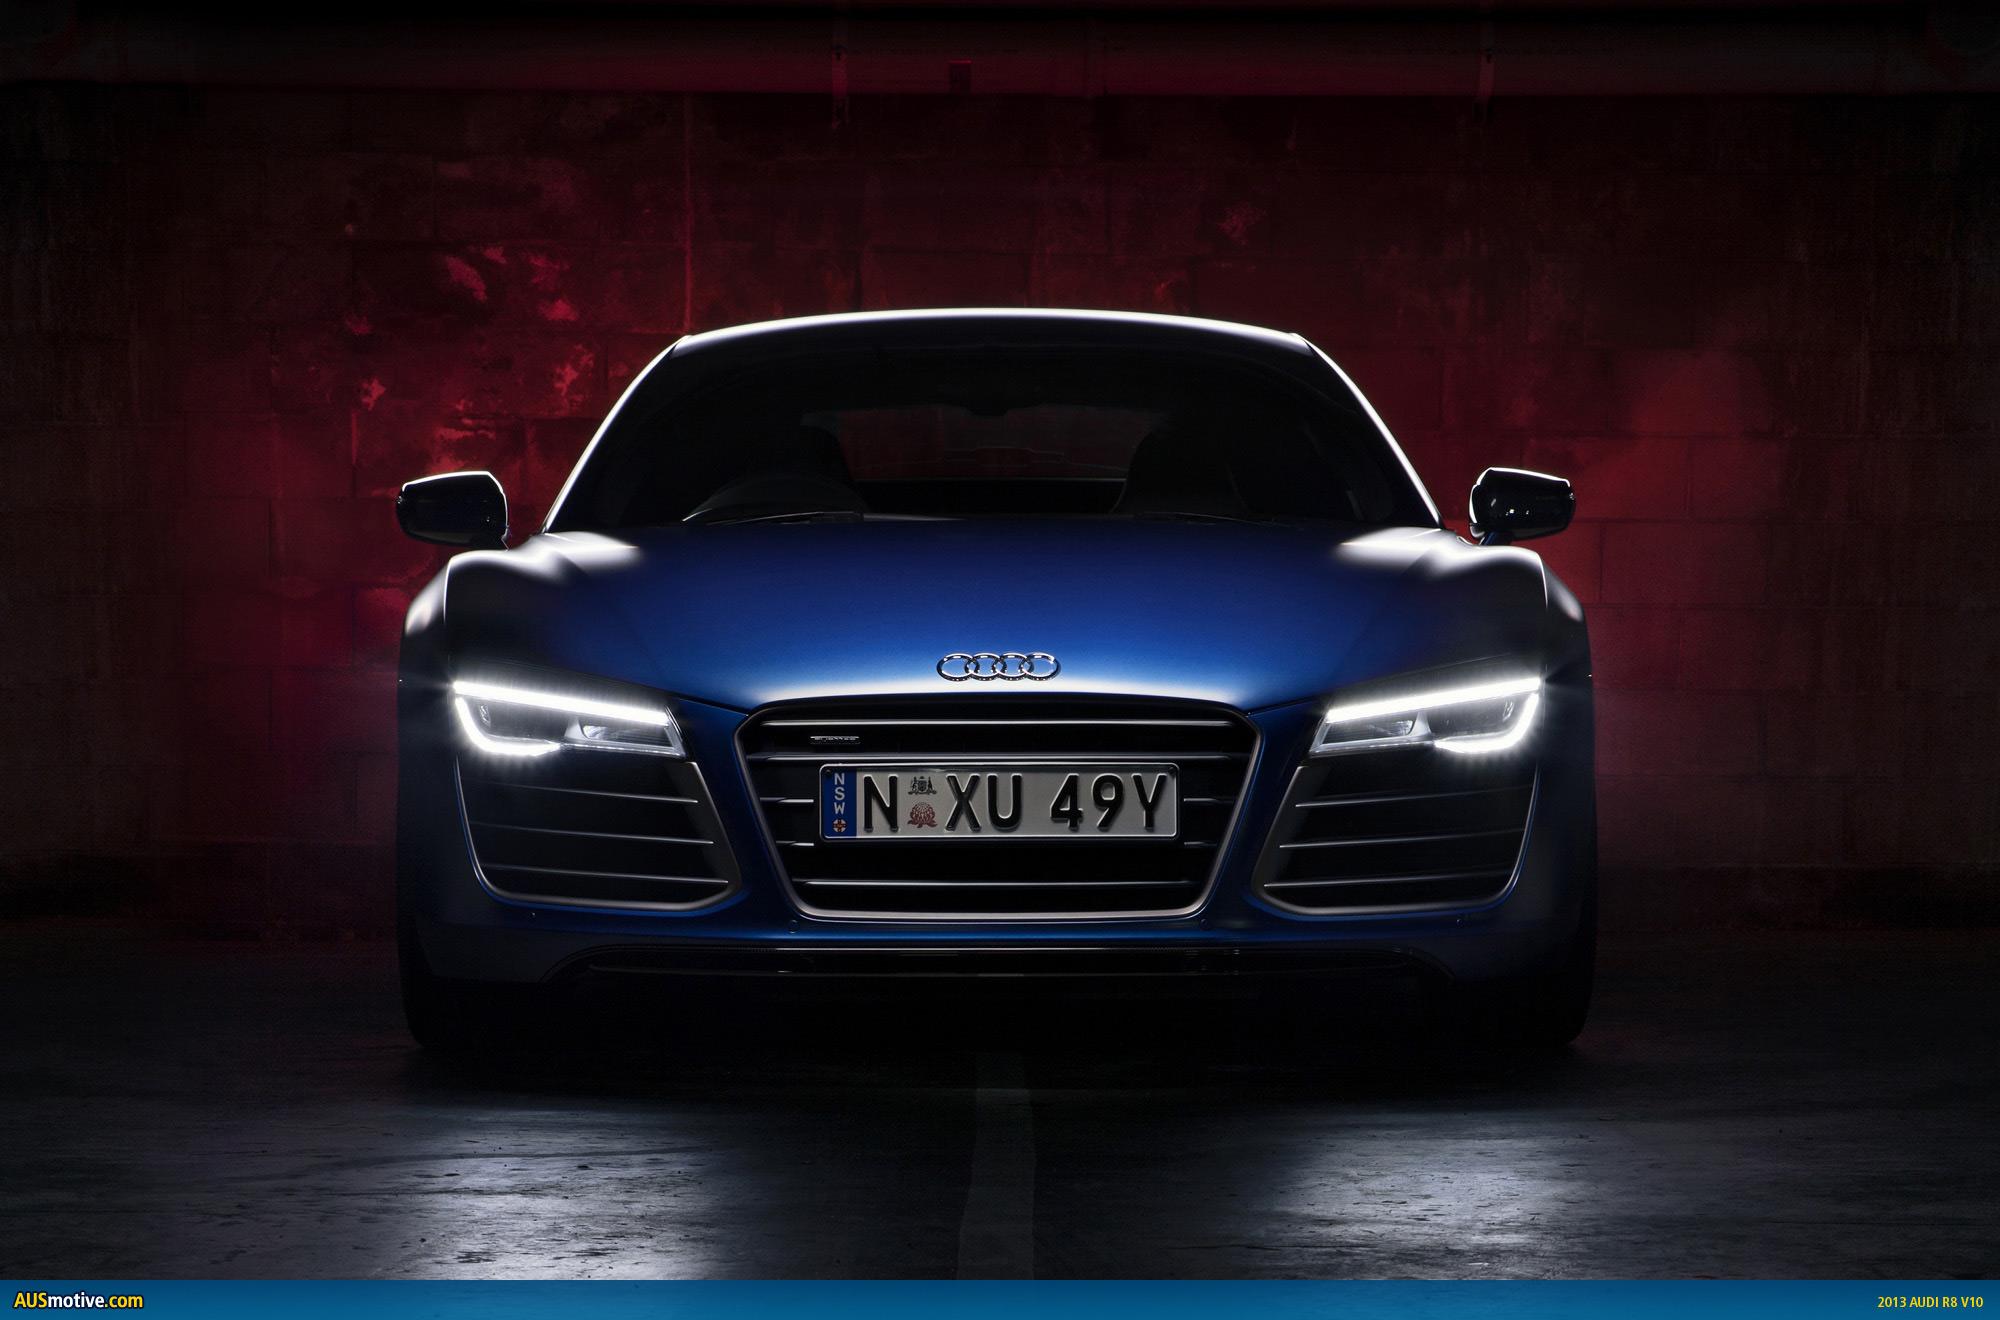 Audi R8 Matte Black Wallpaper Ausmotive Com 187 2013 Audi R8 Australian Pricing Amp Specs